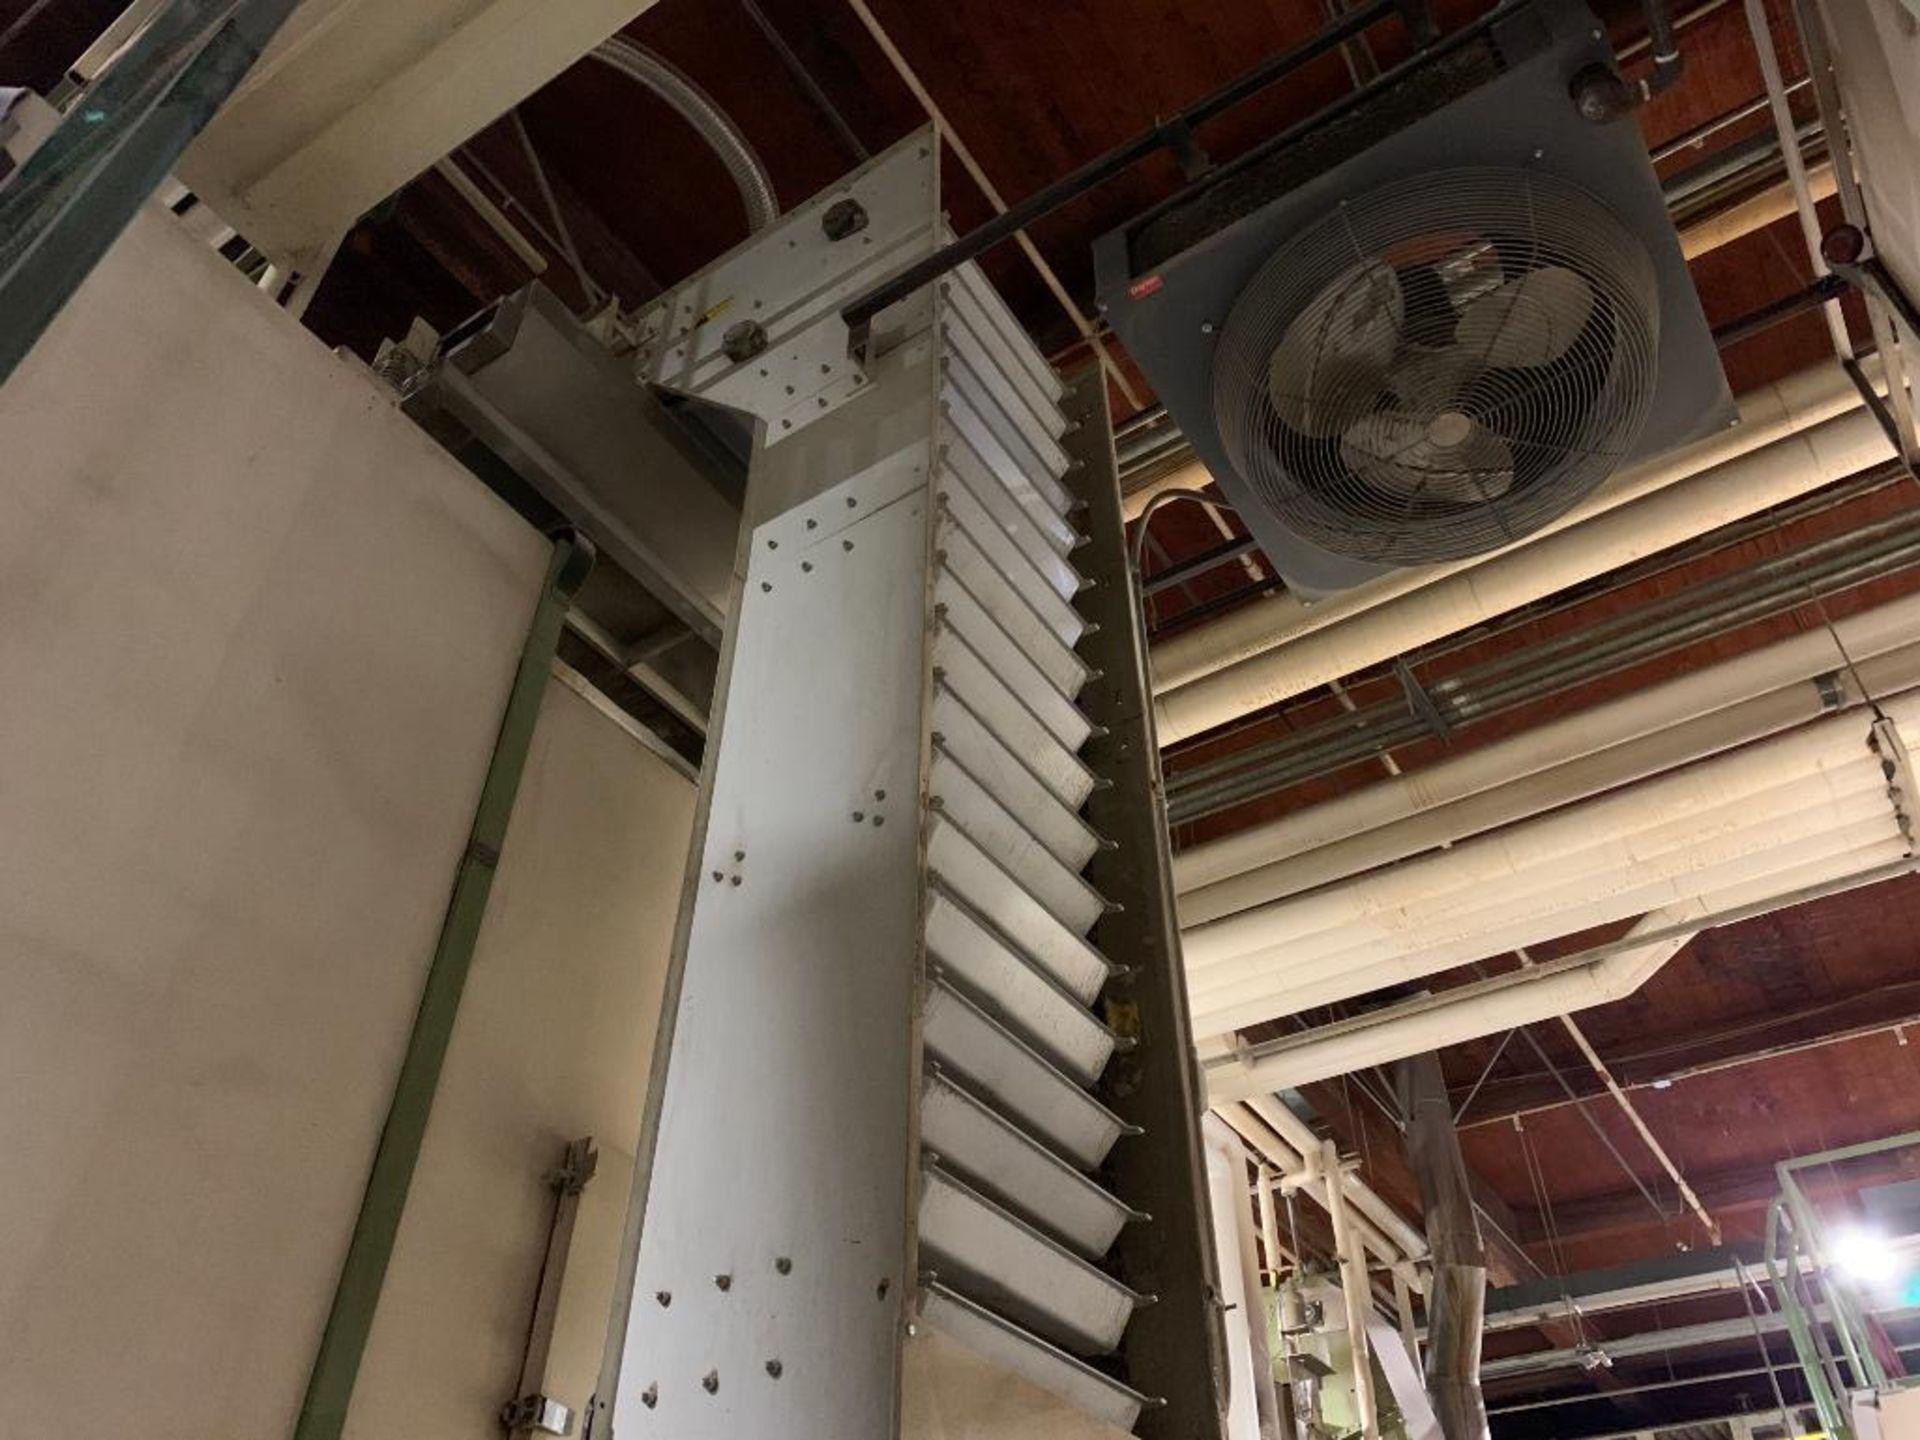 Meyer overlapping bucket elevator, model PA462-24-S - Image 3 of 13